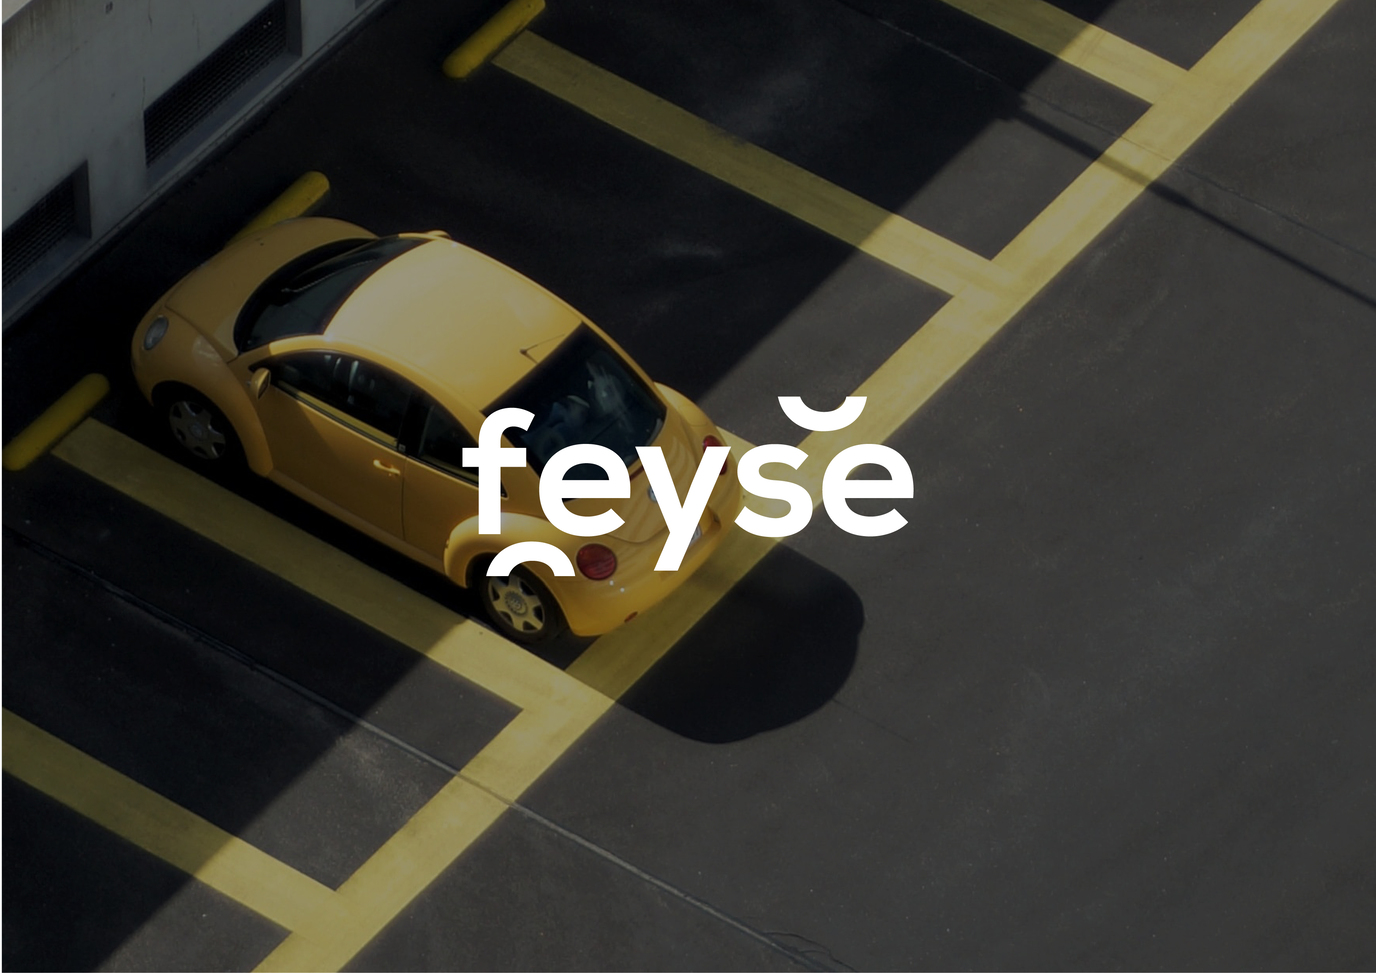 Feyse